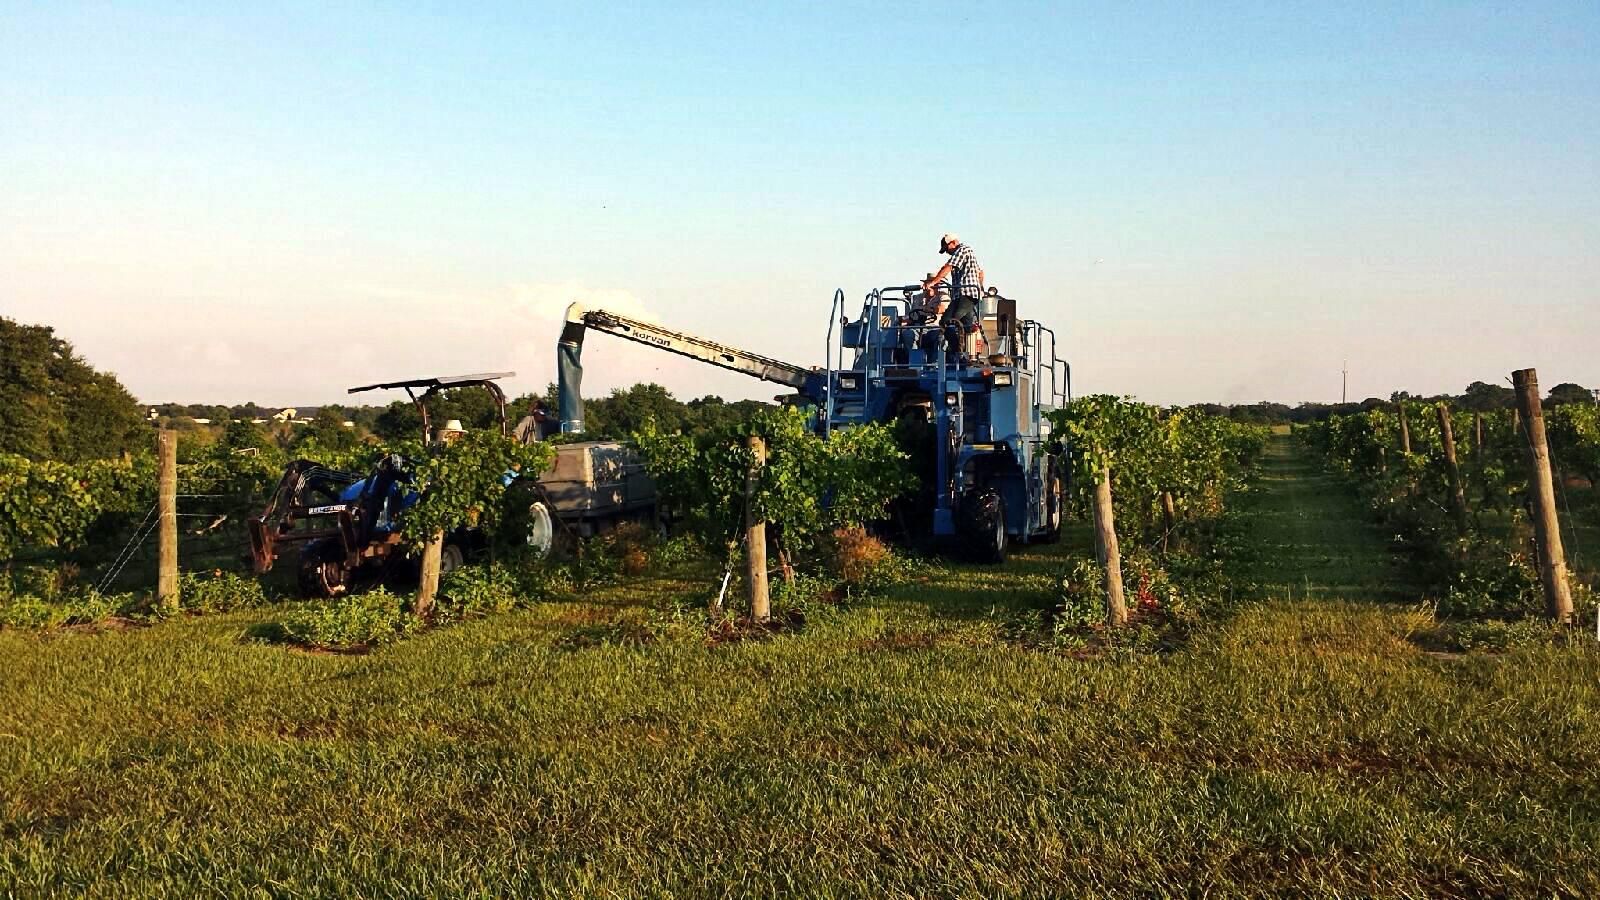 Lovely LakeRidge Winery And Vineyard